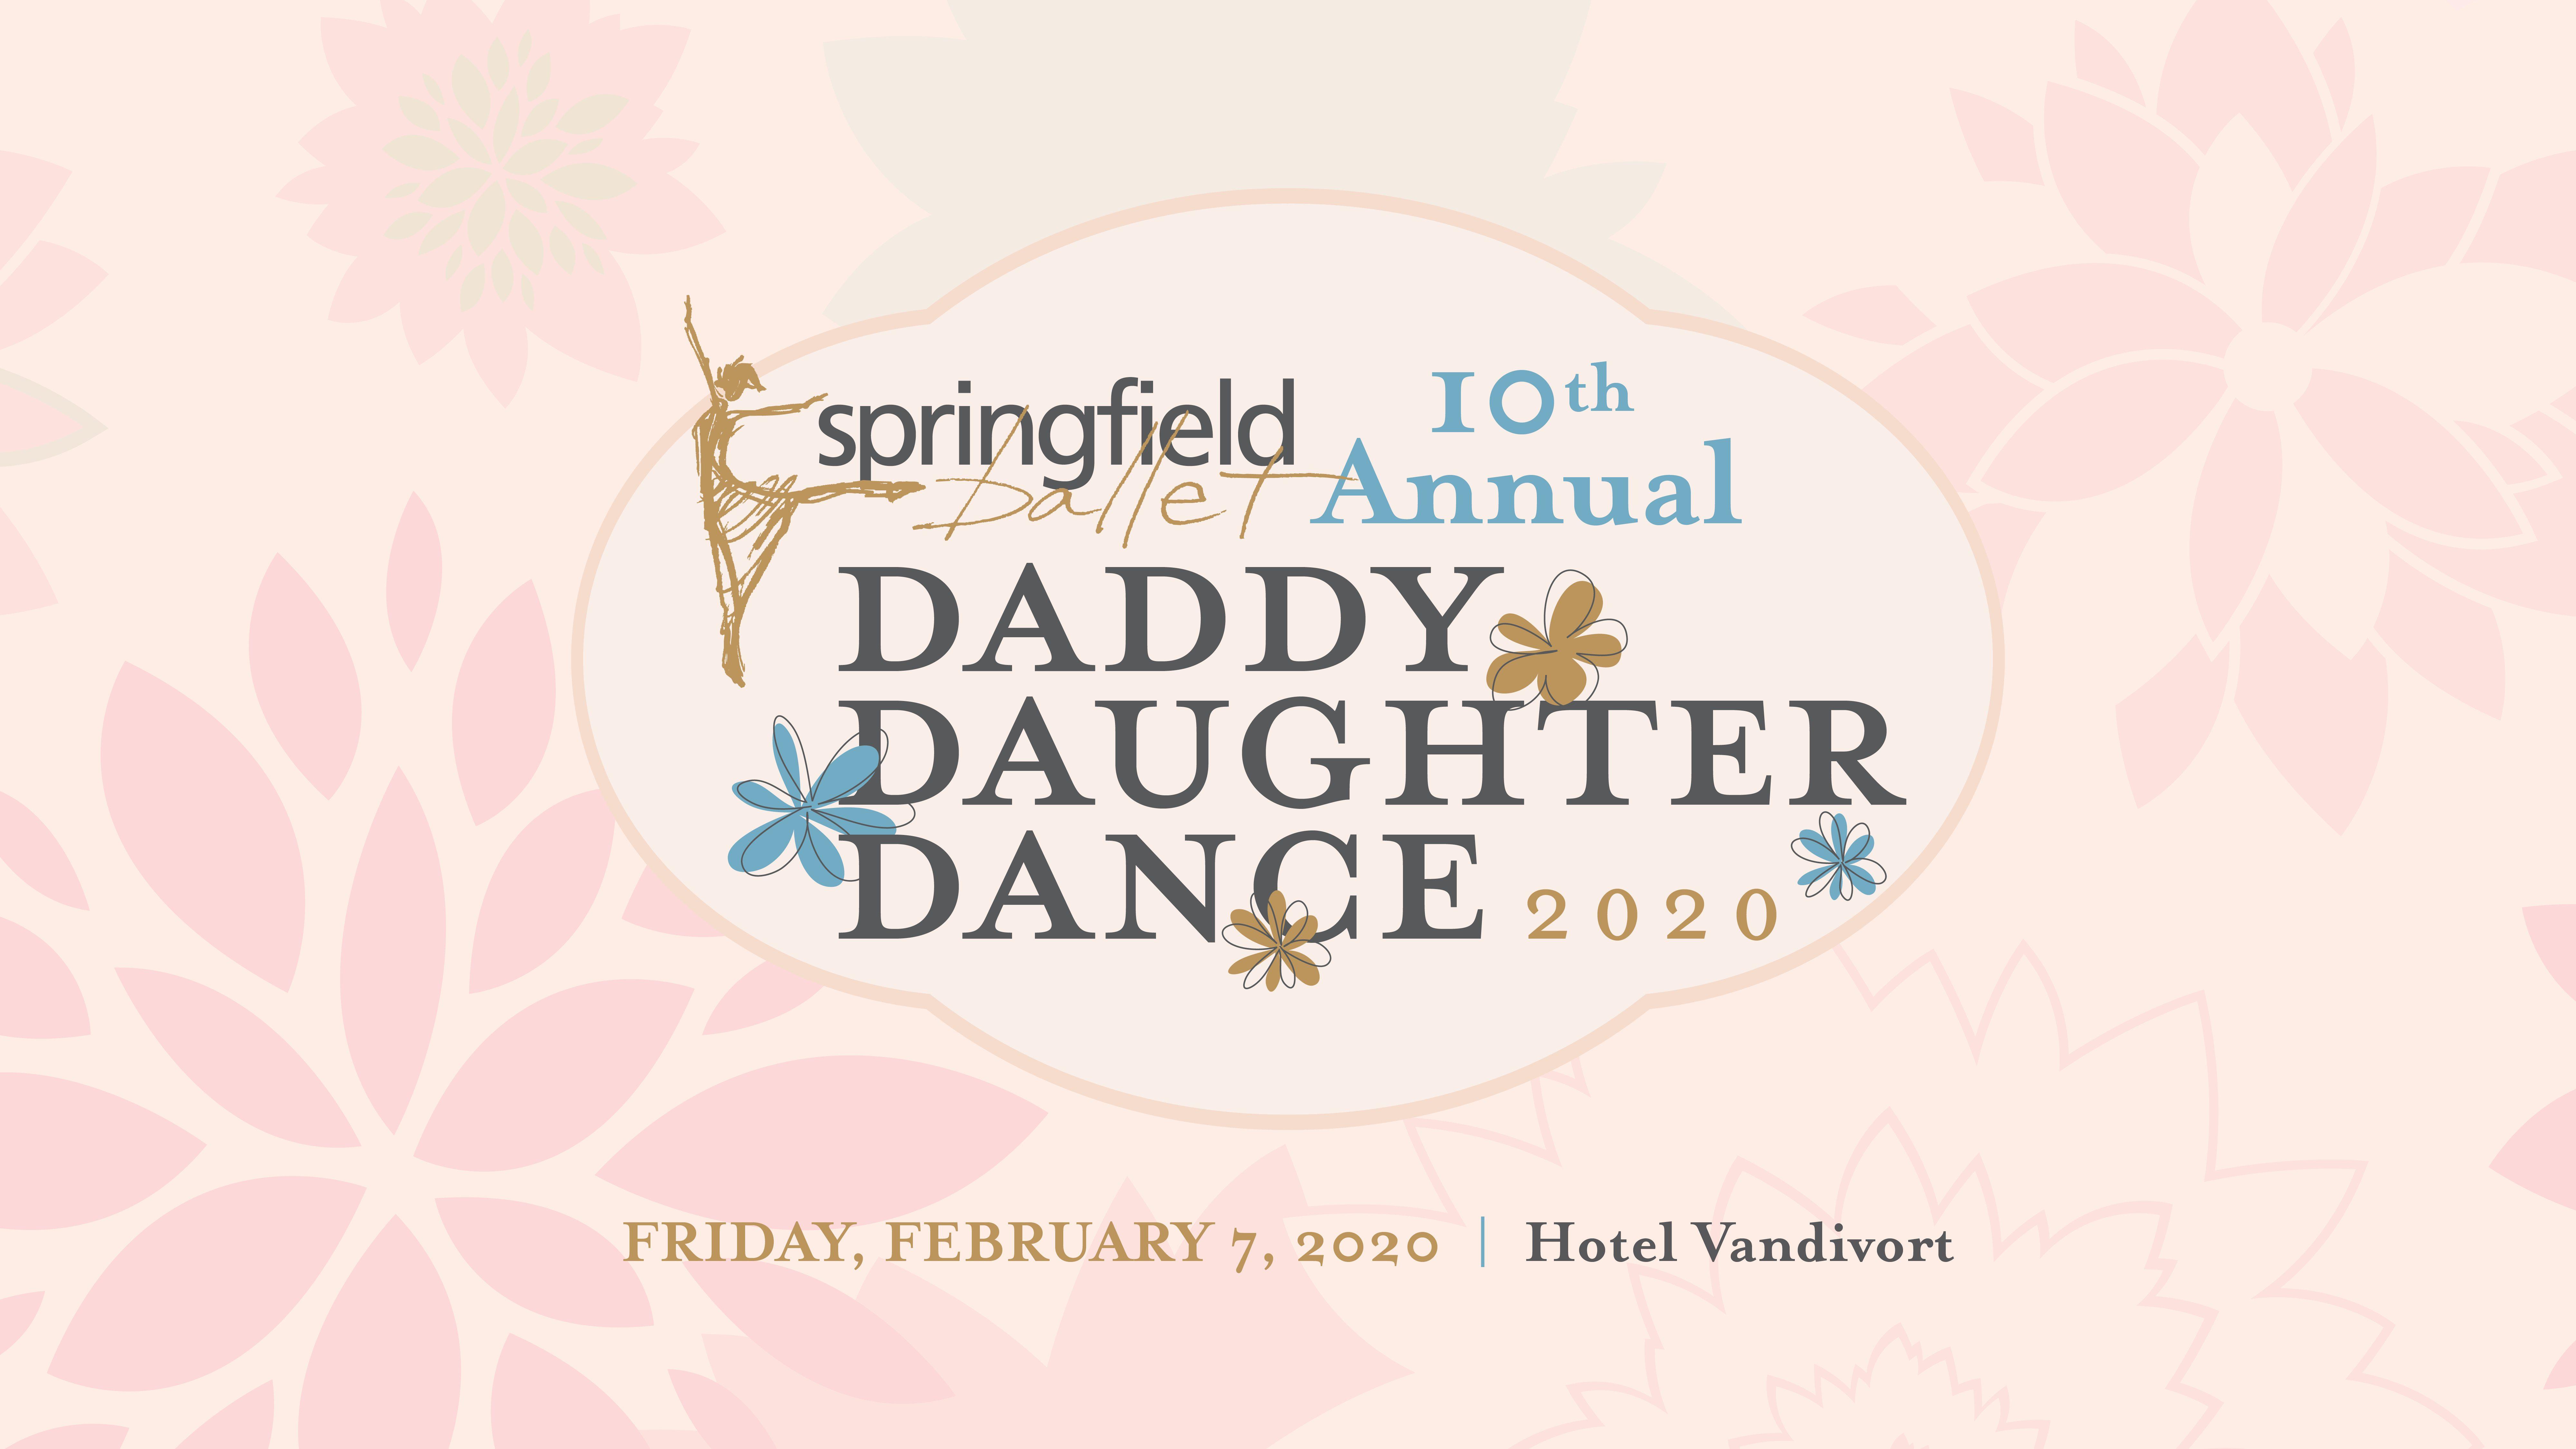 Springfield Ballet dance logo